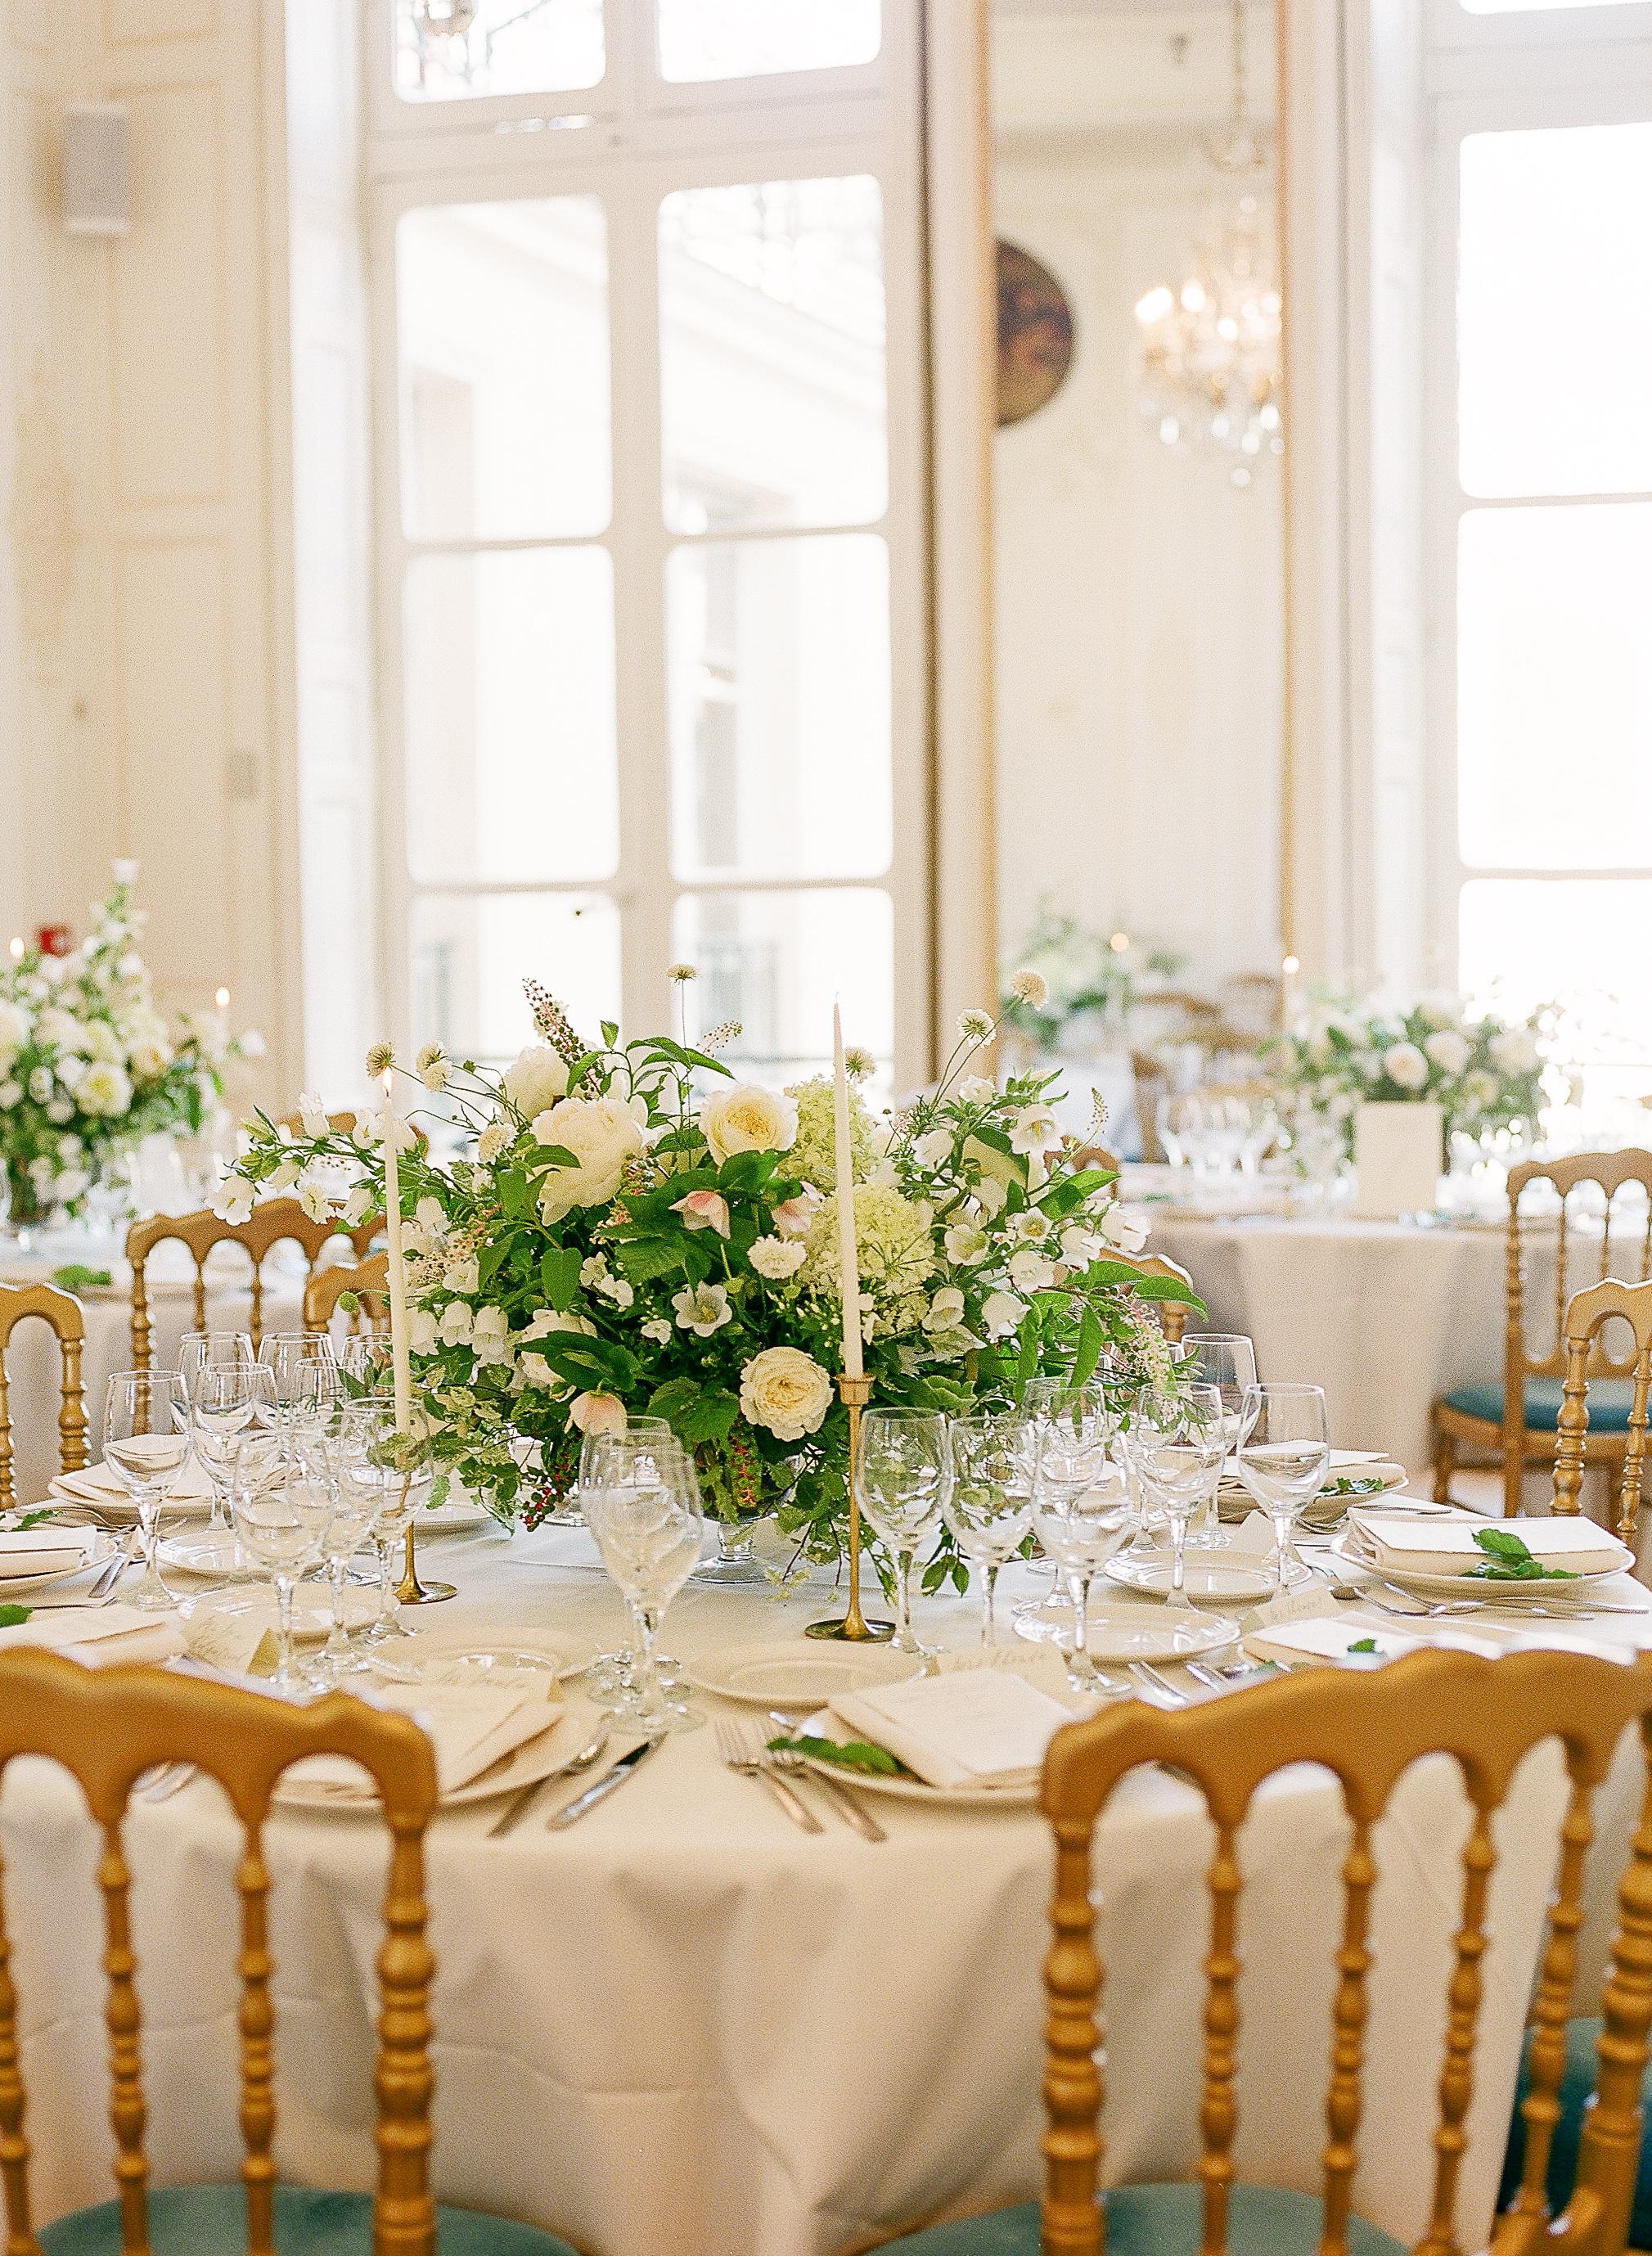 paris-wedding-flowers-peonies-and-garden-roses-at-maison-de-polytechniciens.jpg